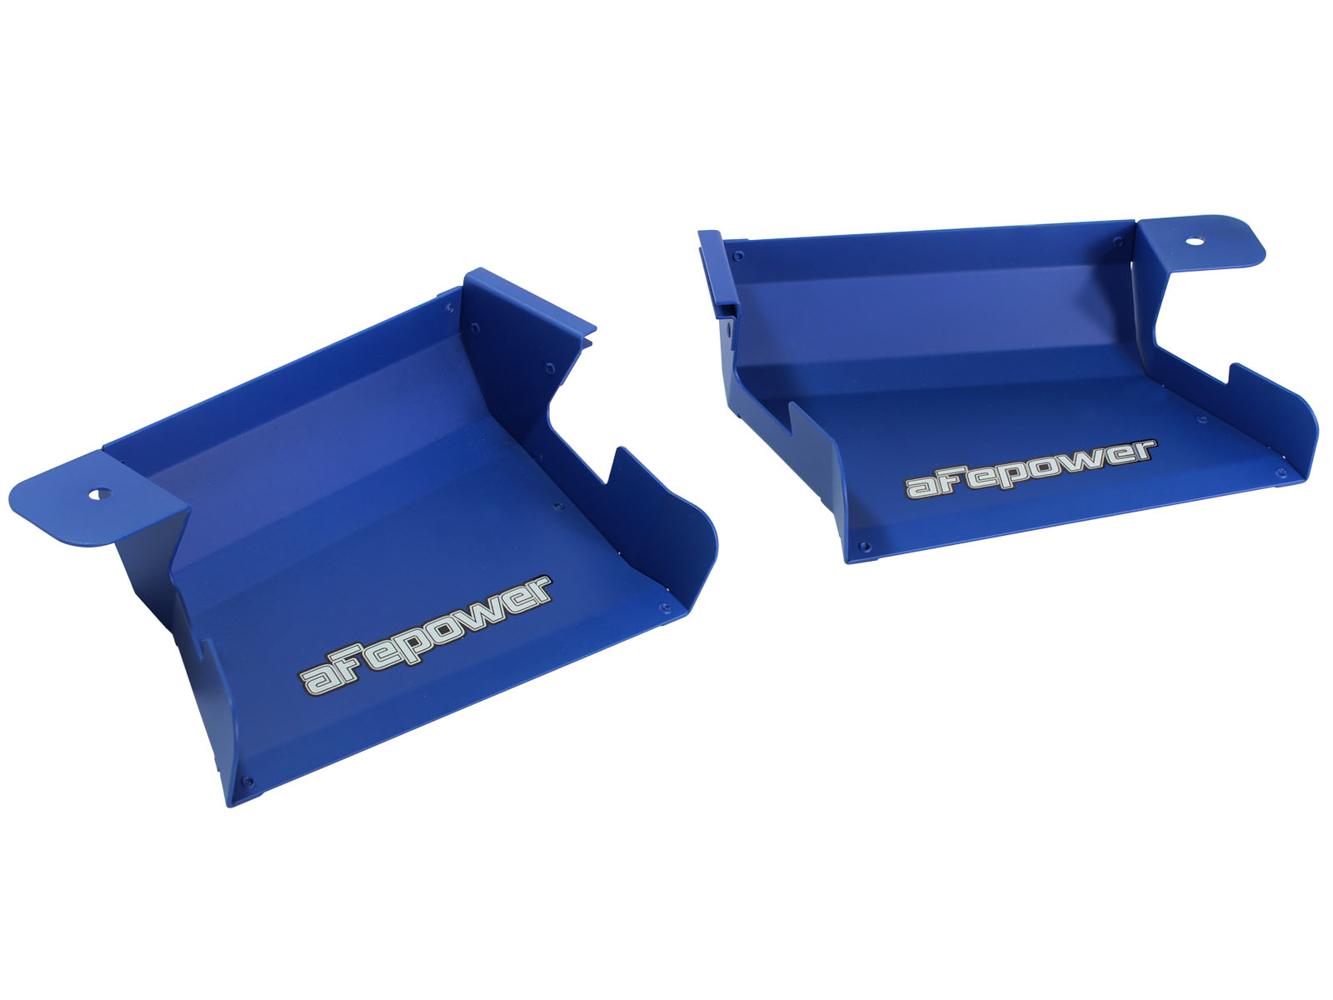 Afe Power Magnum FORCE Dynamic Air Scoop Blue